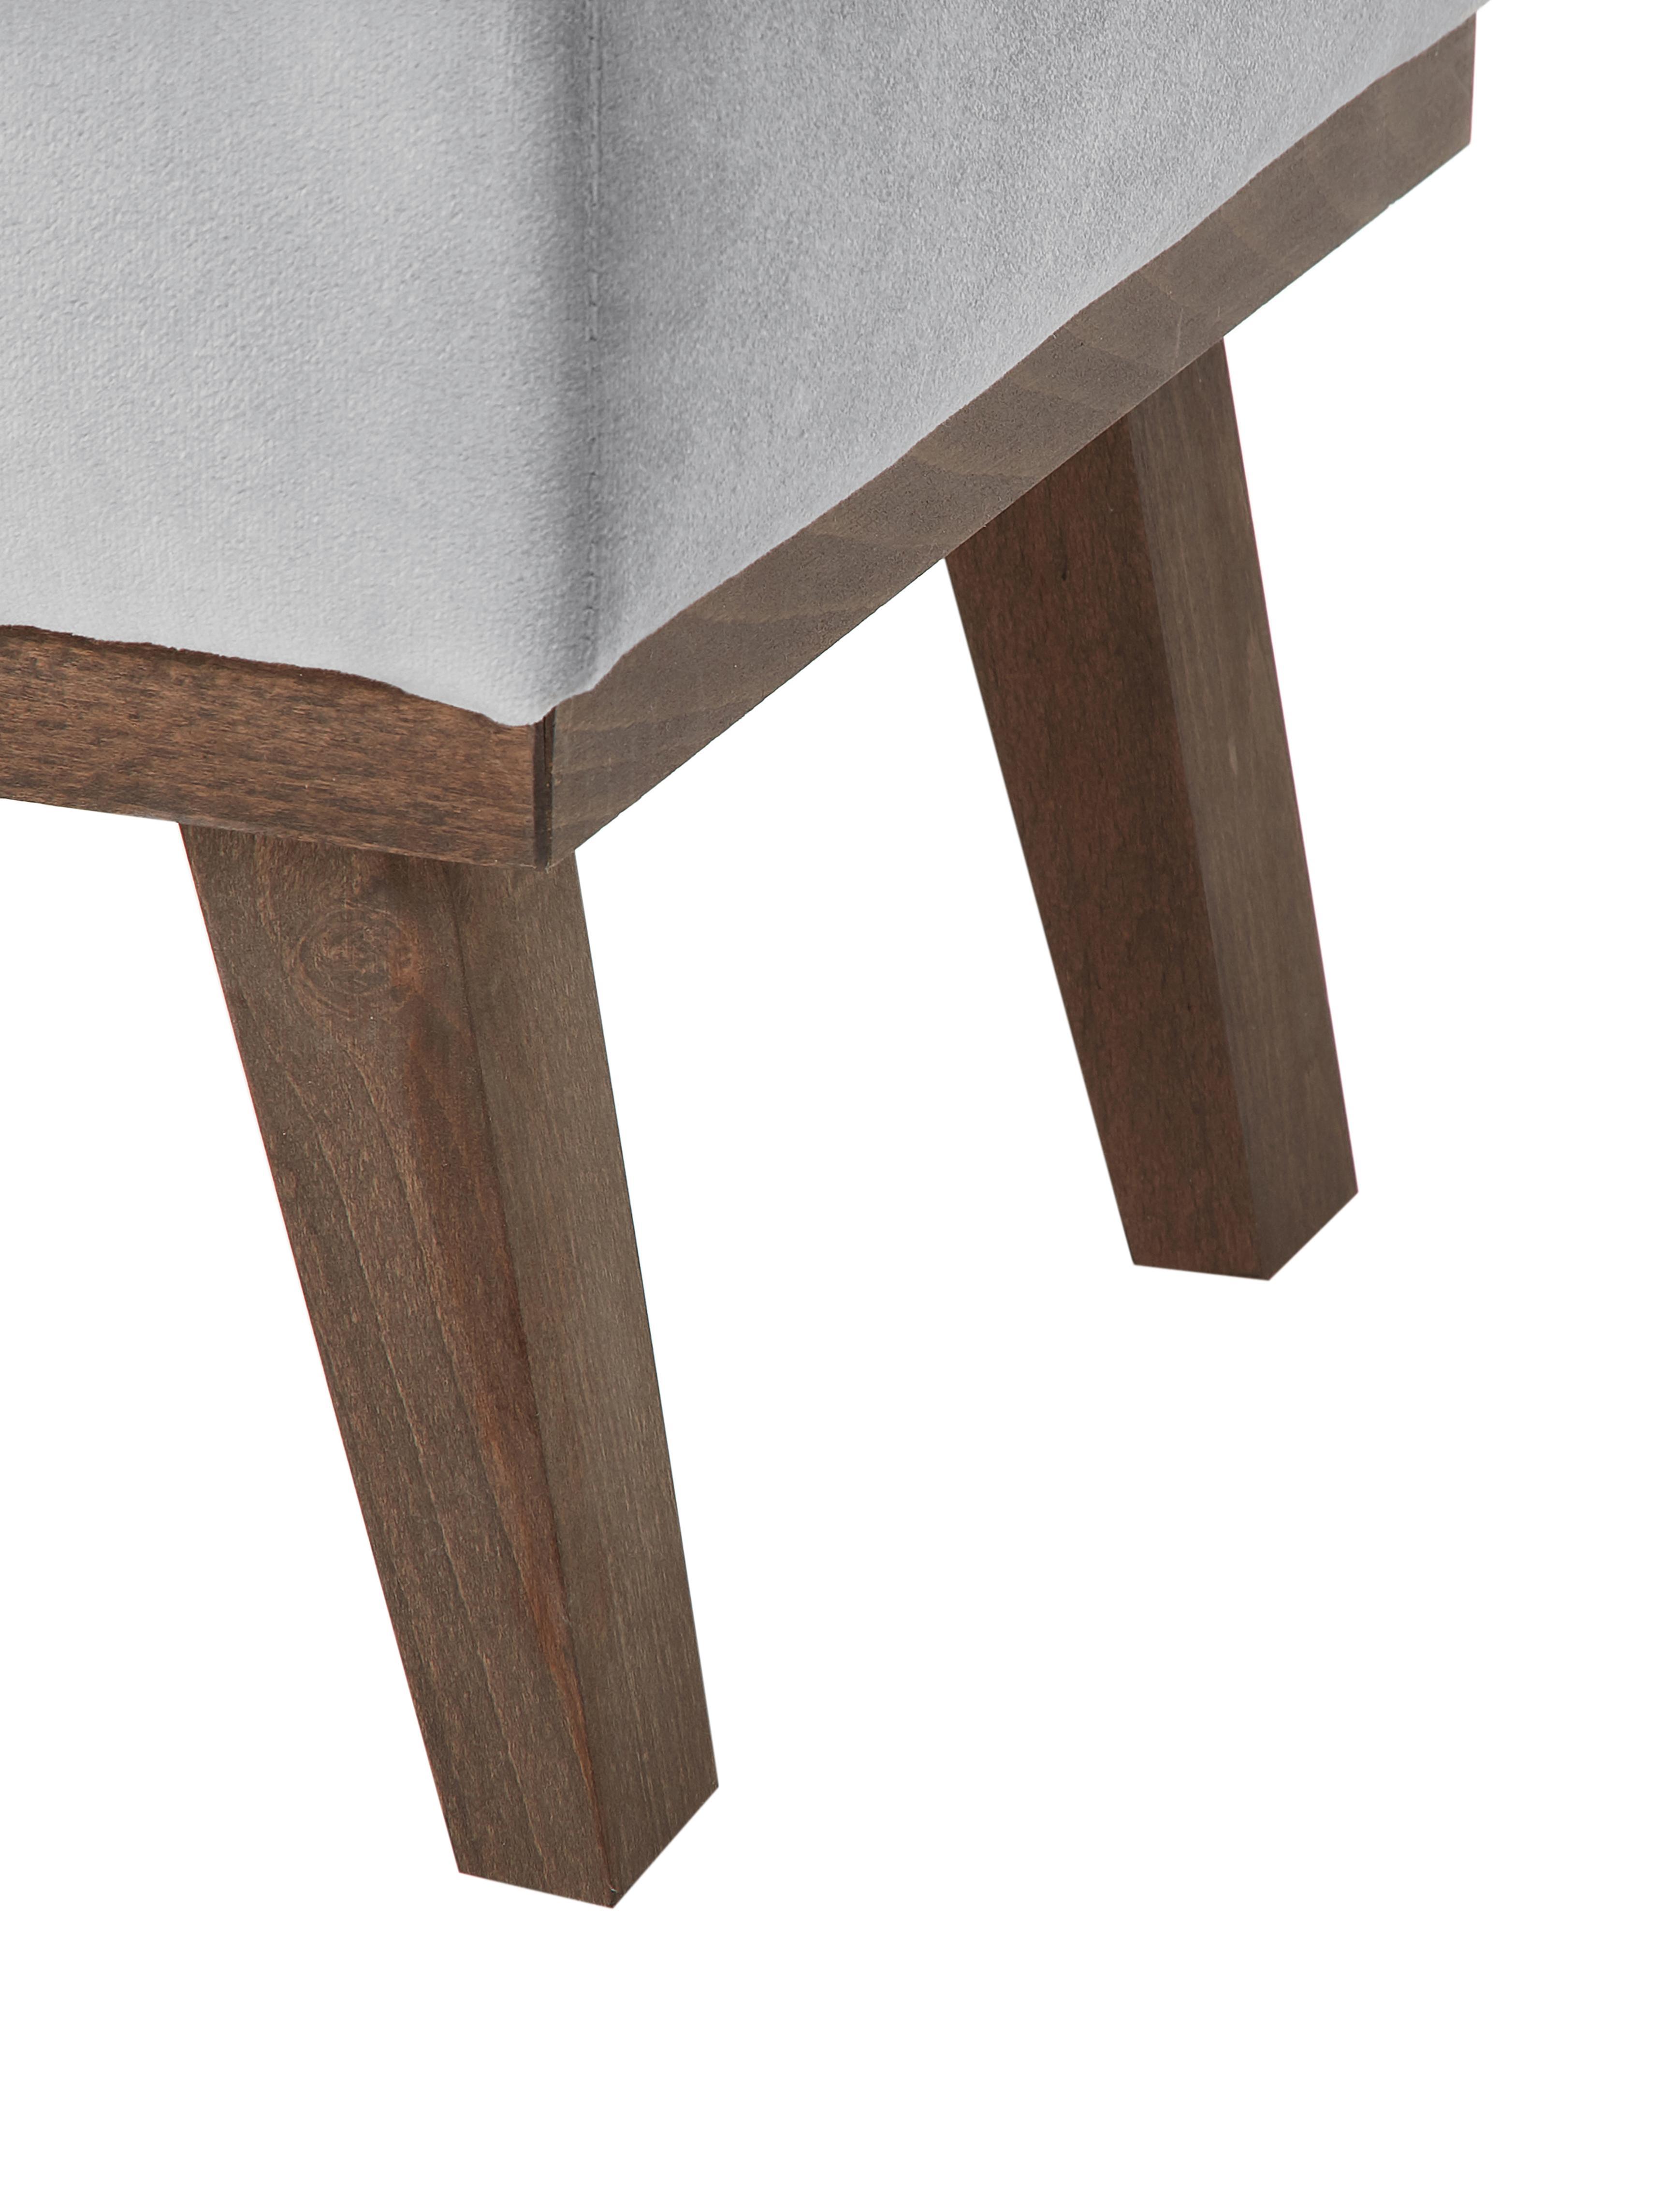 Sofa-Hocker Alva aus Samt, Bezug: Samt (Hochwertiger Polyes, Gestell: Massives Kiefernholz, Füße: Massives Buchenholz, gebe, Grau, 74 x 30 cm